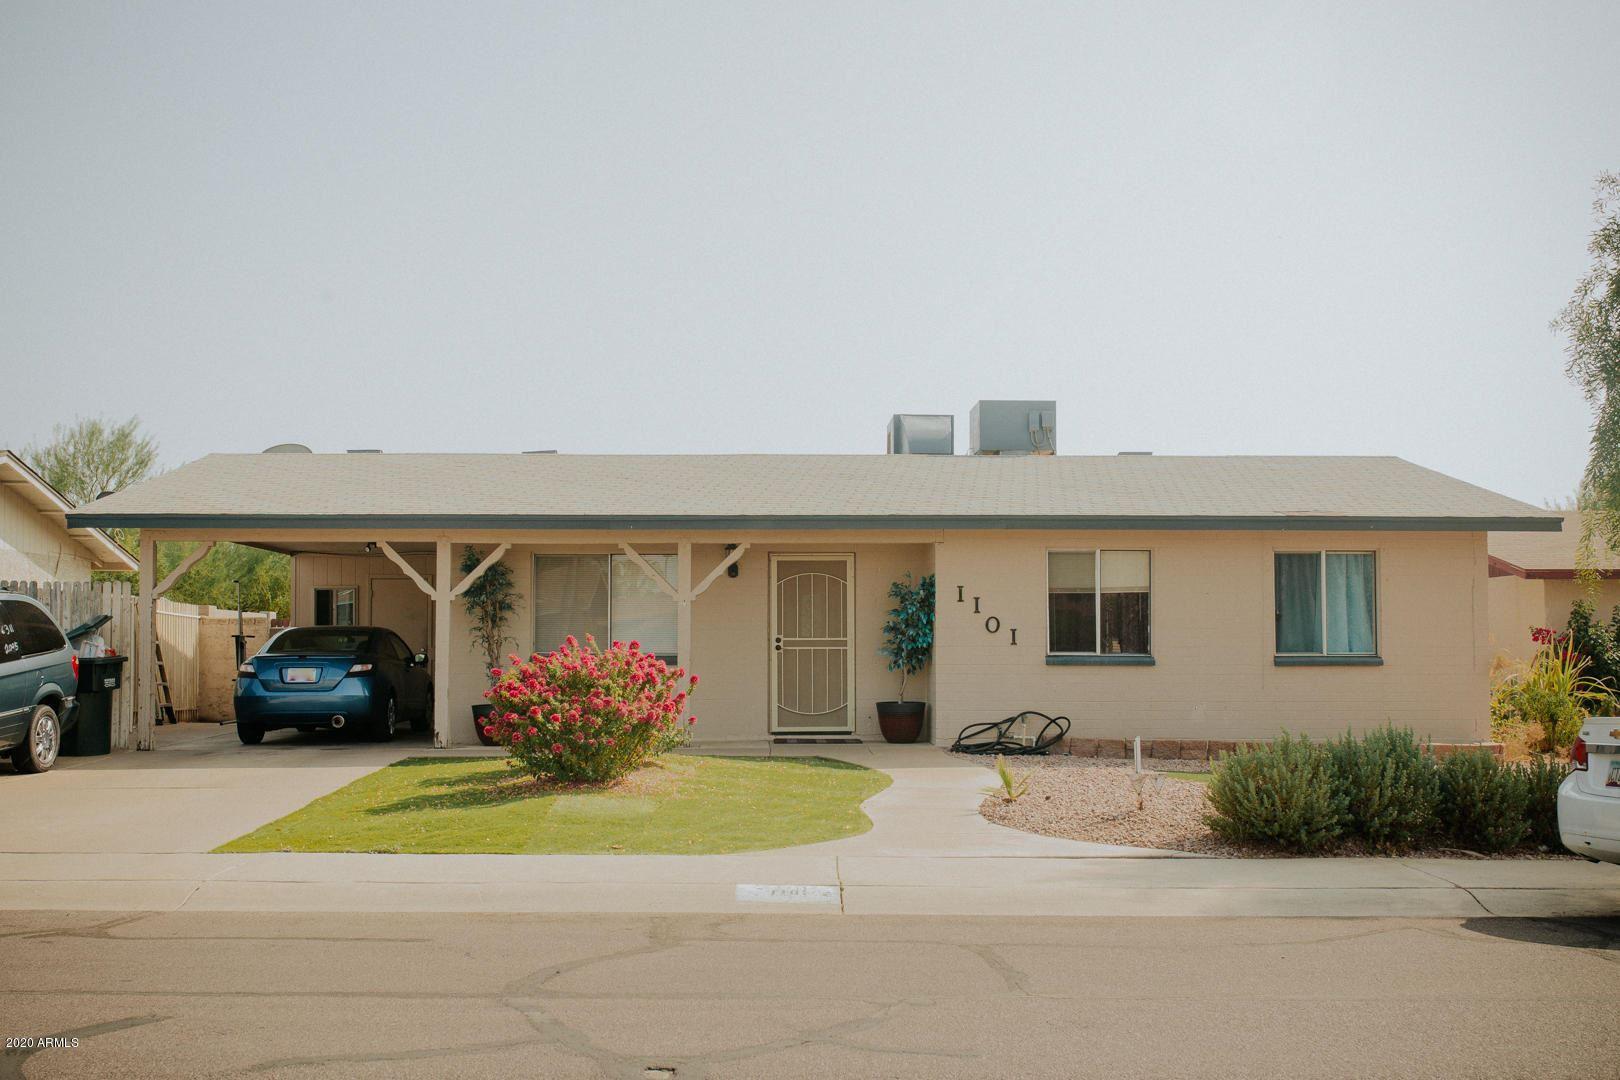 1101 W ANGELA Drive, Phoenix, AZ 85023 - MLS#: 6132372